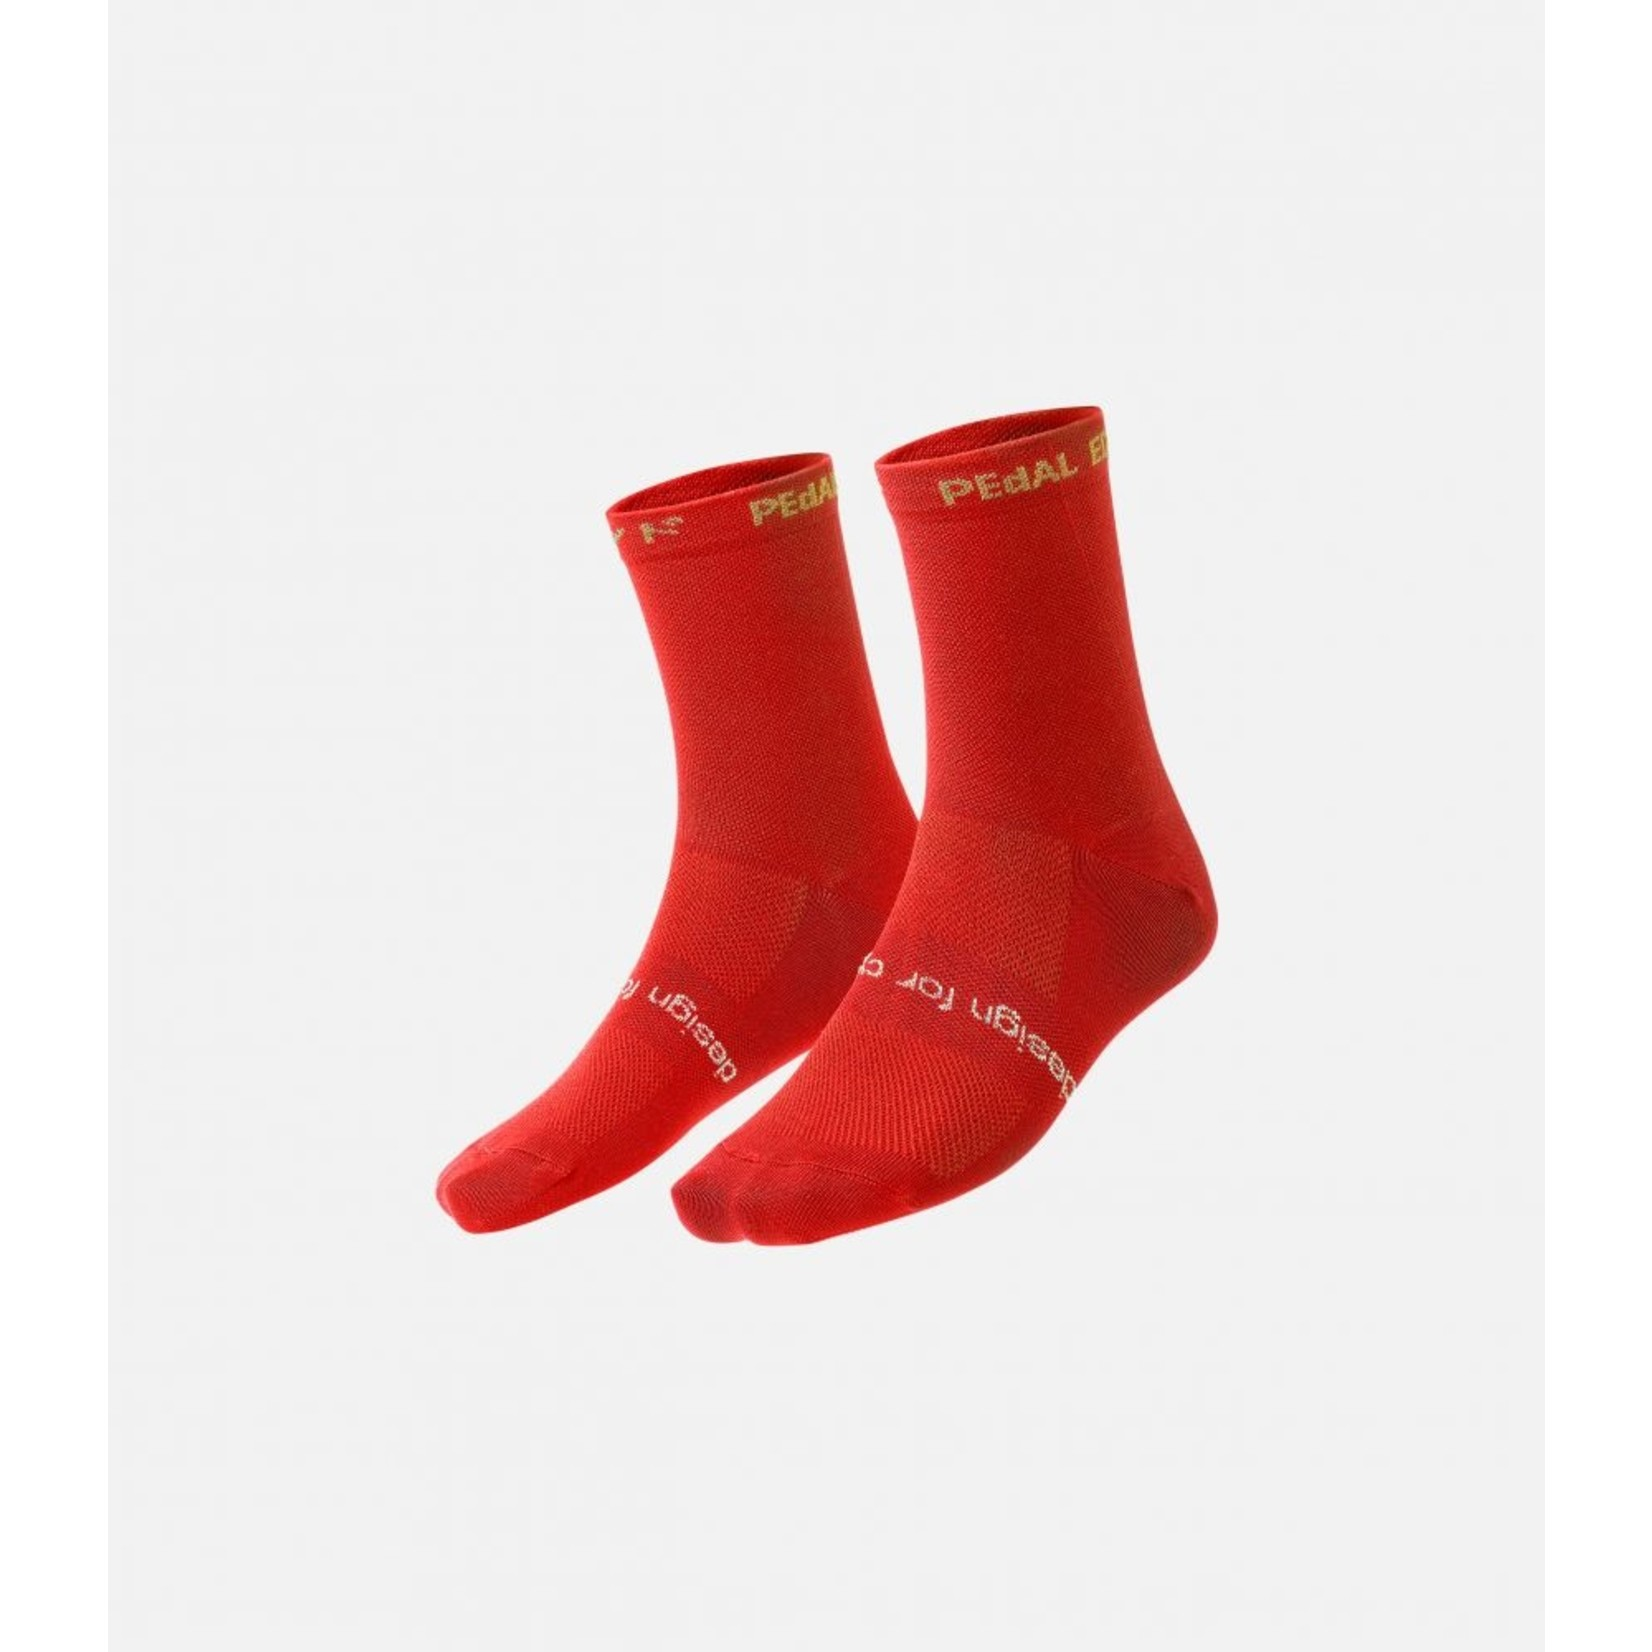 PEdALED PEdALED Yurei regular socks S red